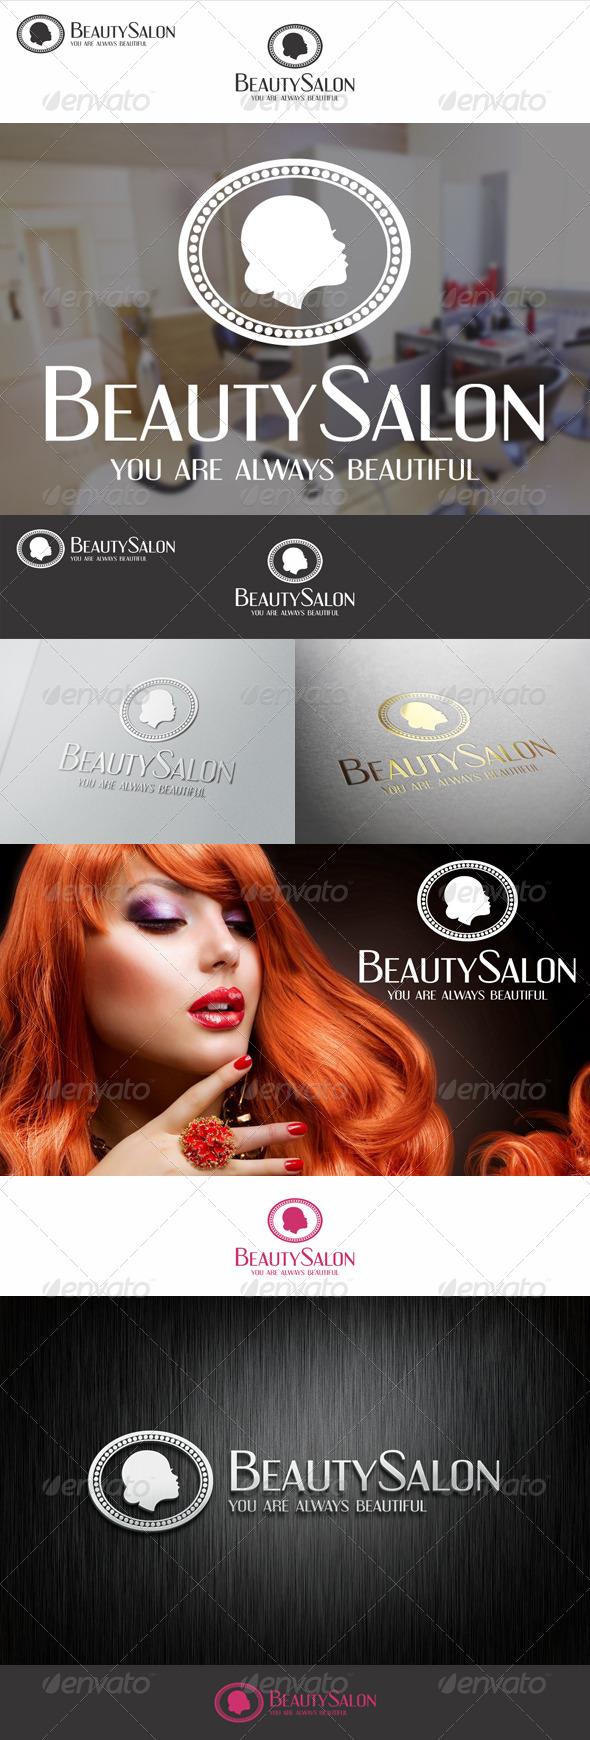 GraphicRiver Beauty Salon Badge Logo 7500245